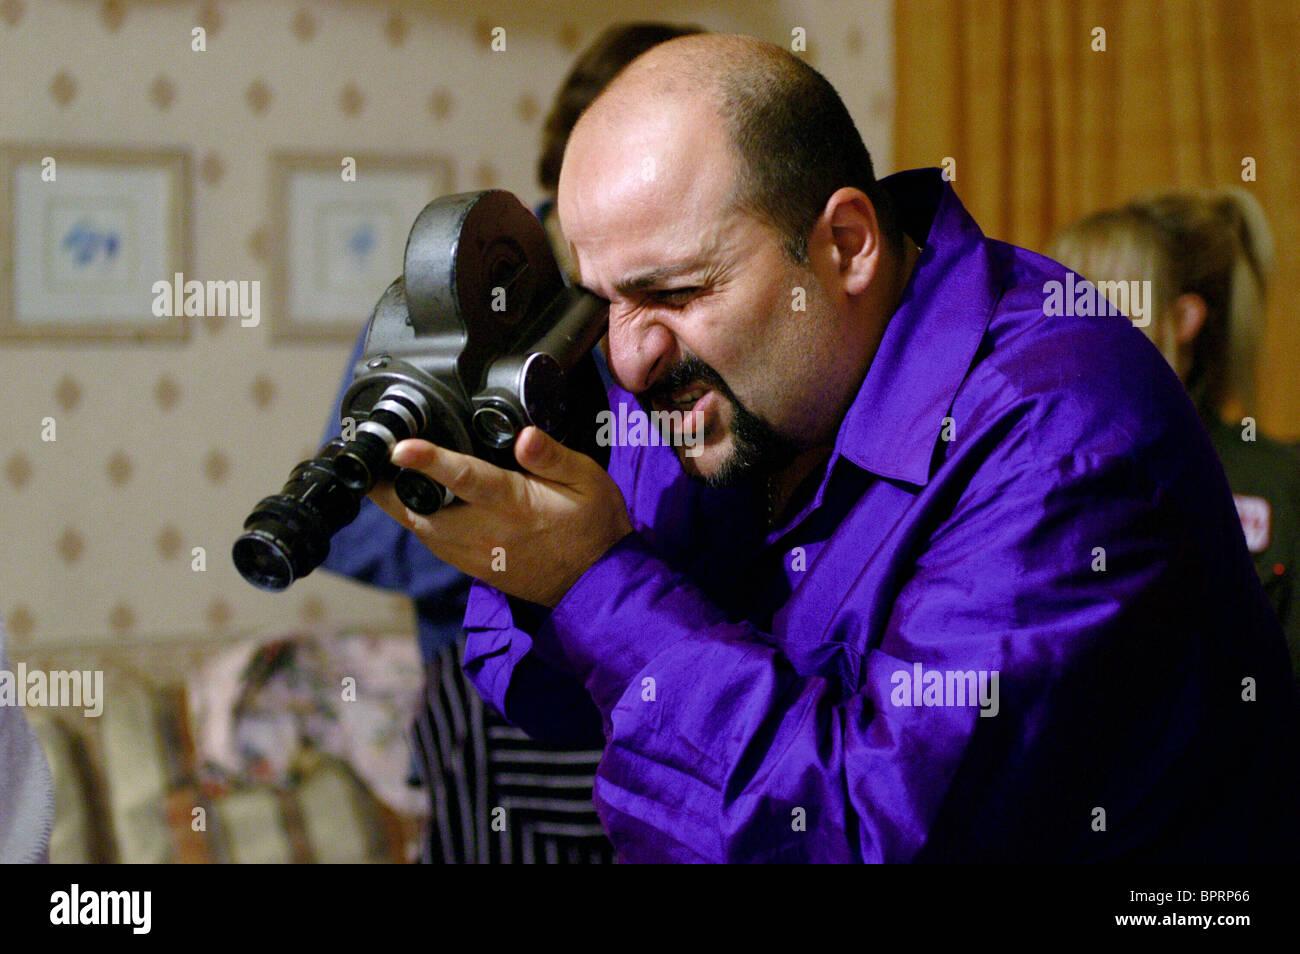 OMID DJALILI ALIEN AUTOPSY (2006) - Stock Image